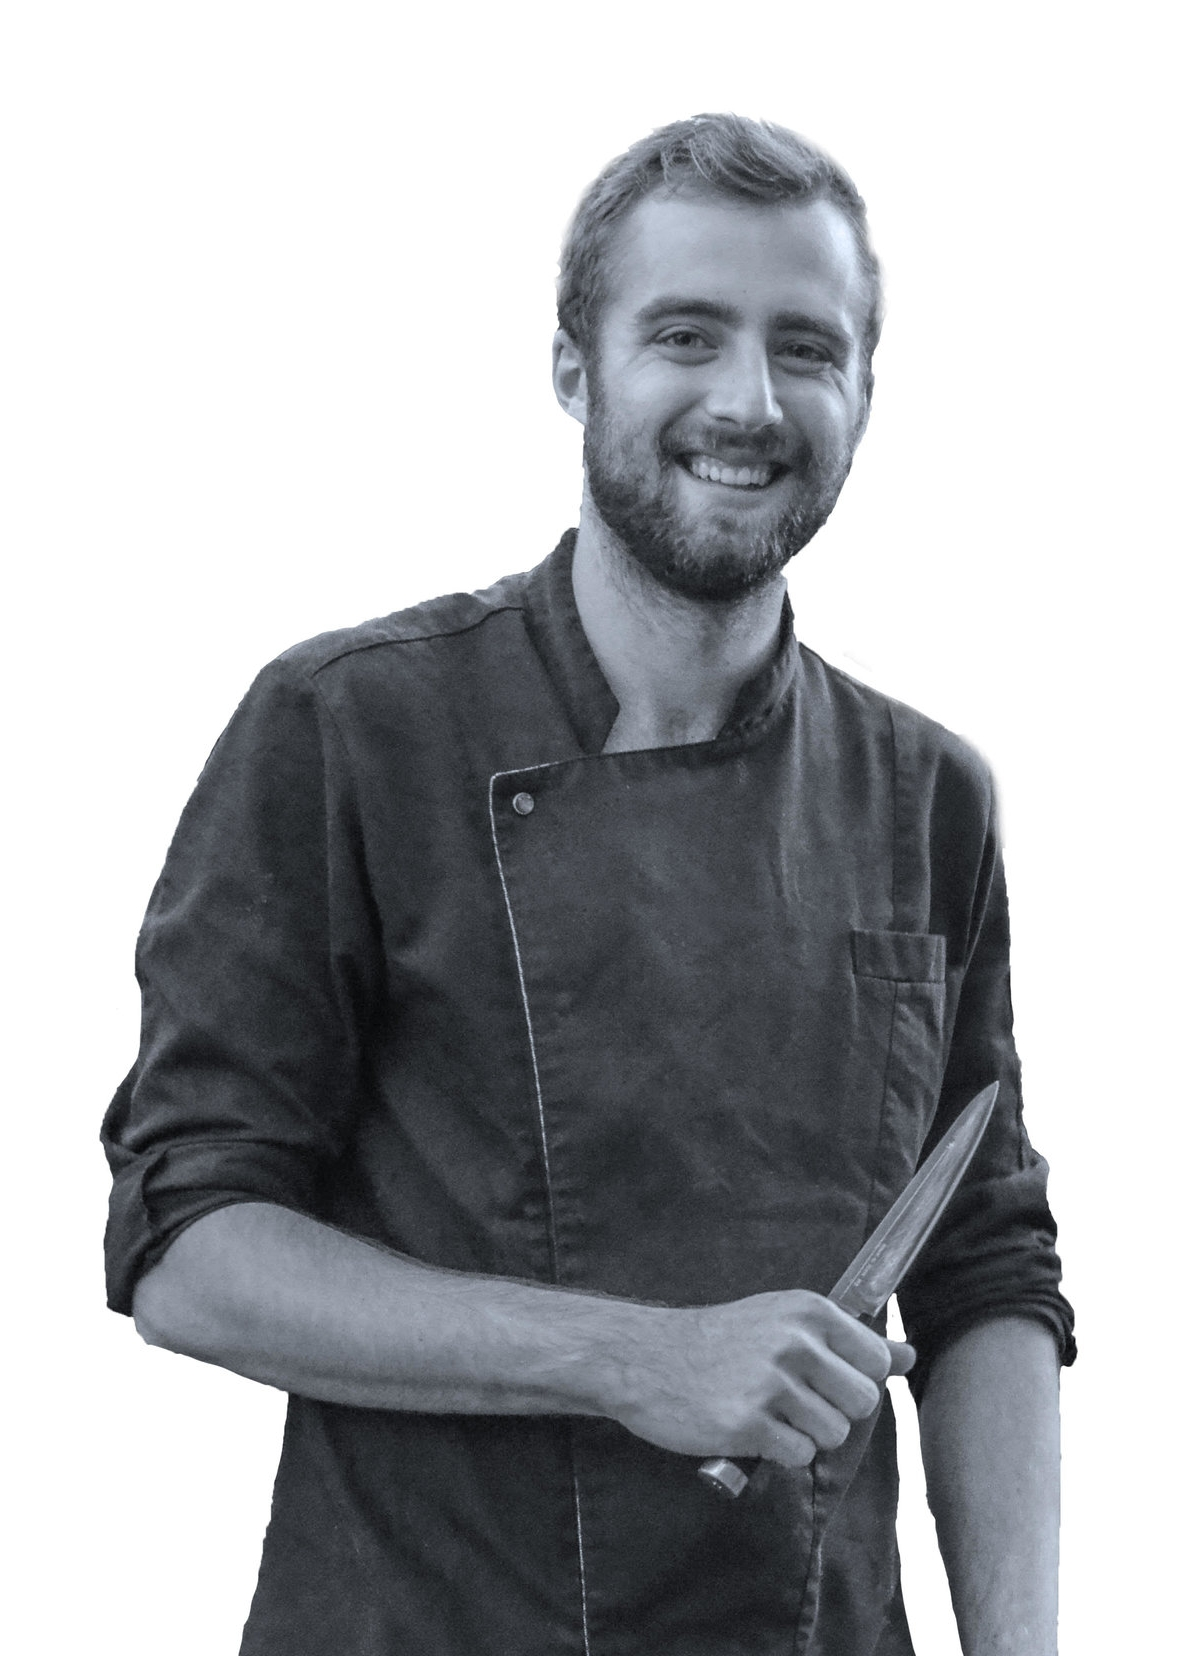 "Chef Nathan           Normal    0          21          false    false    false       FR-BE    JA    X-NONE                                                                                                                                                                                                                                                                                                                                                                                                                                                                                                                           /* Style Definitions */ table.MsoNormalTable {mso-style-name:""Tableau Normal""; mso-tstyle-rowband-size:0; mso-tstyle-colband-size:0; mso-style-noshow:yes; mso-style-priority:99; mso-style-parent:""""; mso-padding-alt:0cm 5.4pt 0cm 5.4pt; mso-para-margin:0cm; mso-para-margin-bottom:.0001pt; mso-pagination:widow-orphan; font-size:10.0pt; font-family:""Times New Roman""; border:none;}       Nathan, 21, is chef-kok van het Winery Brugmann. Hij is opgeleid aan de Namen Hotelschool en gespecialiseerd in Franse gastronomische gerechten en lokale producten."